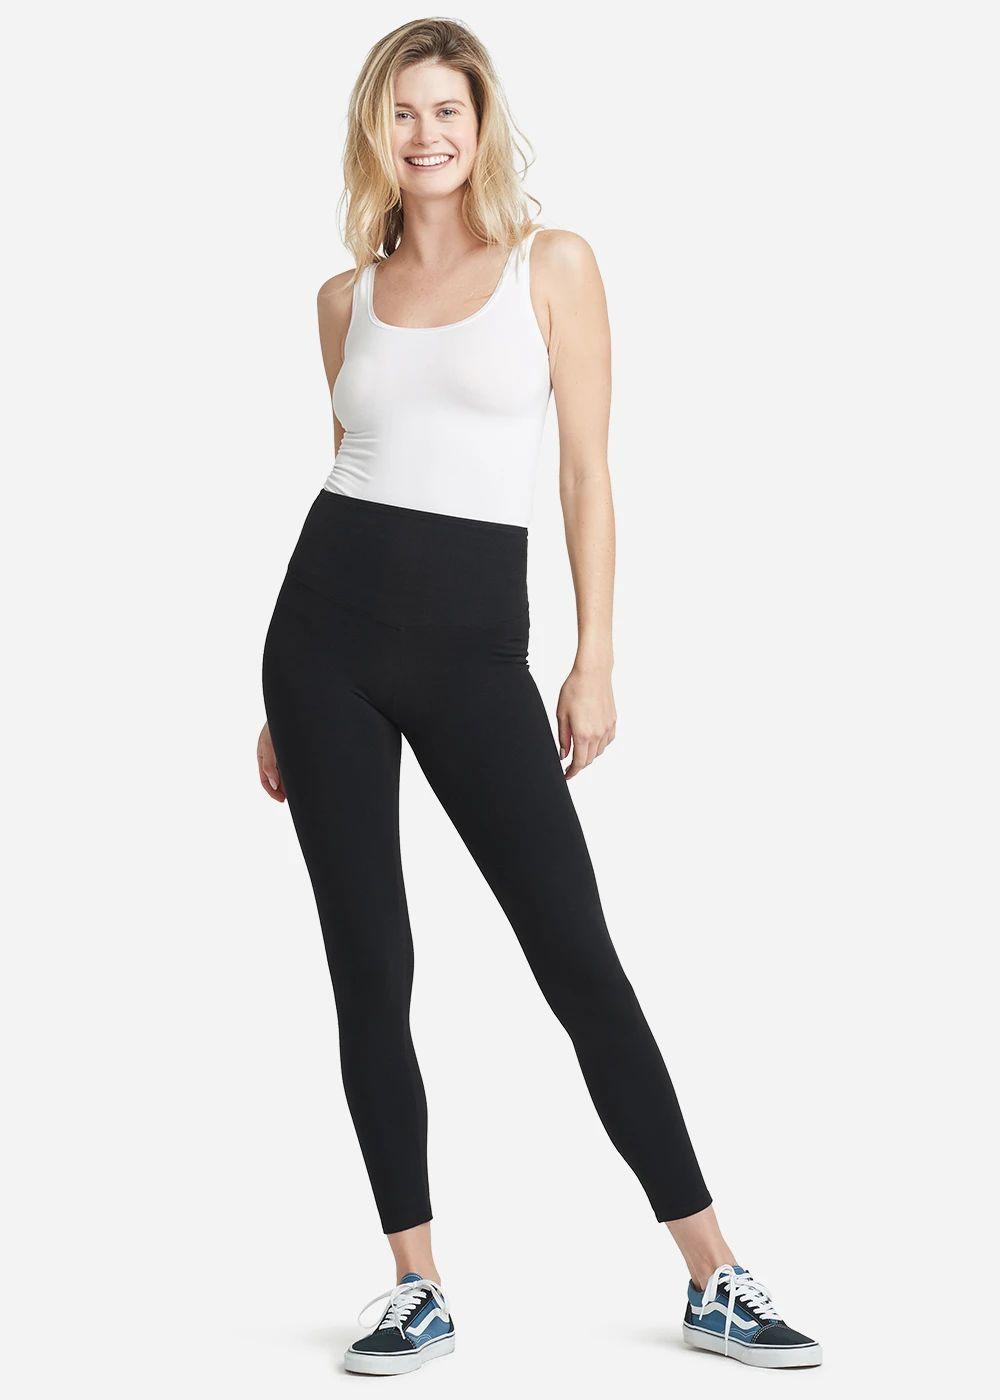 White Cotton Top with legging